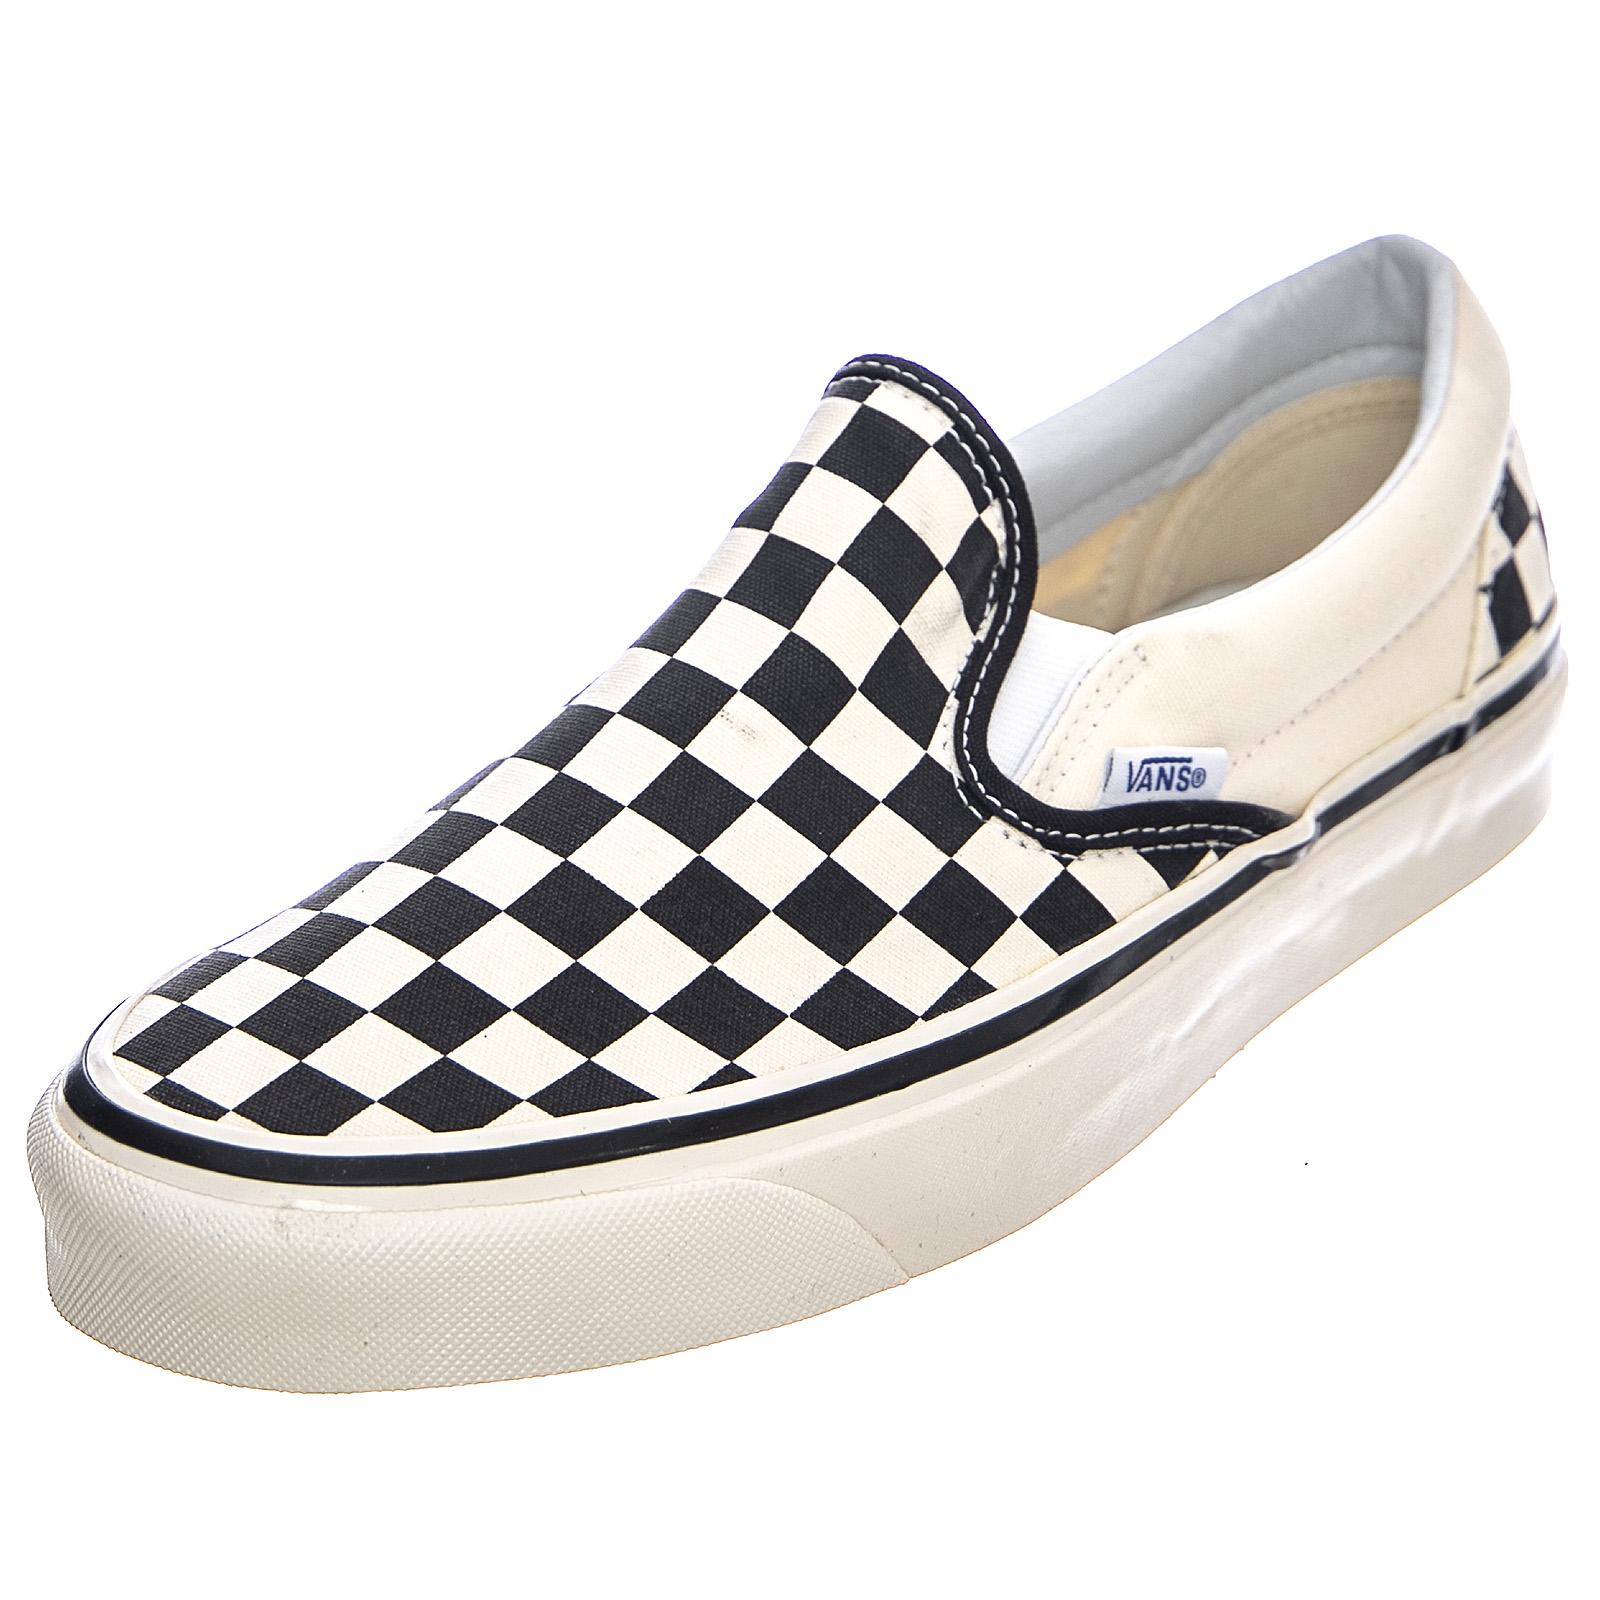 Vans anaheim factory classic slip - on 98-multicolor-low shoes   eBay